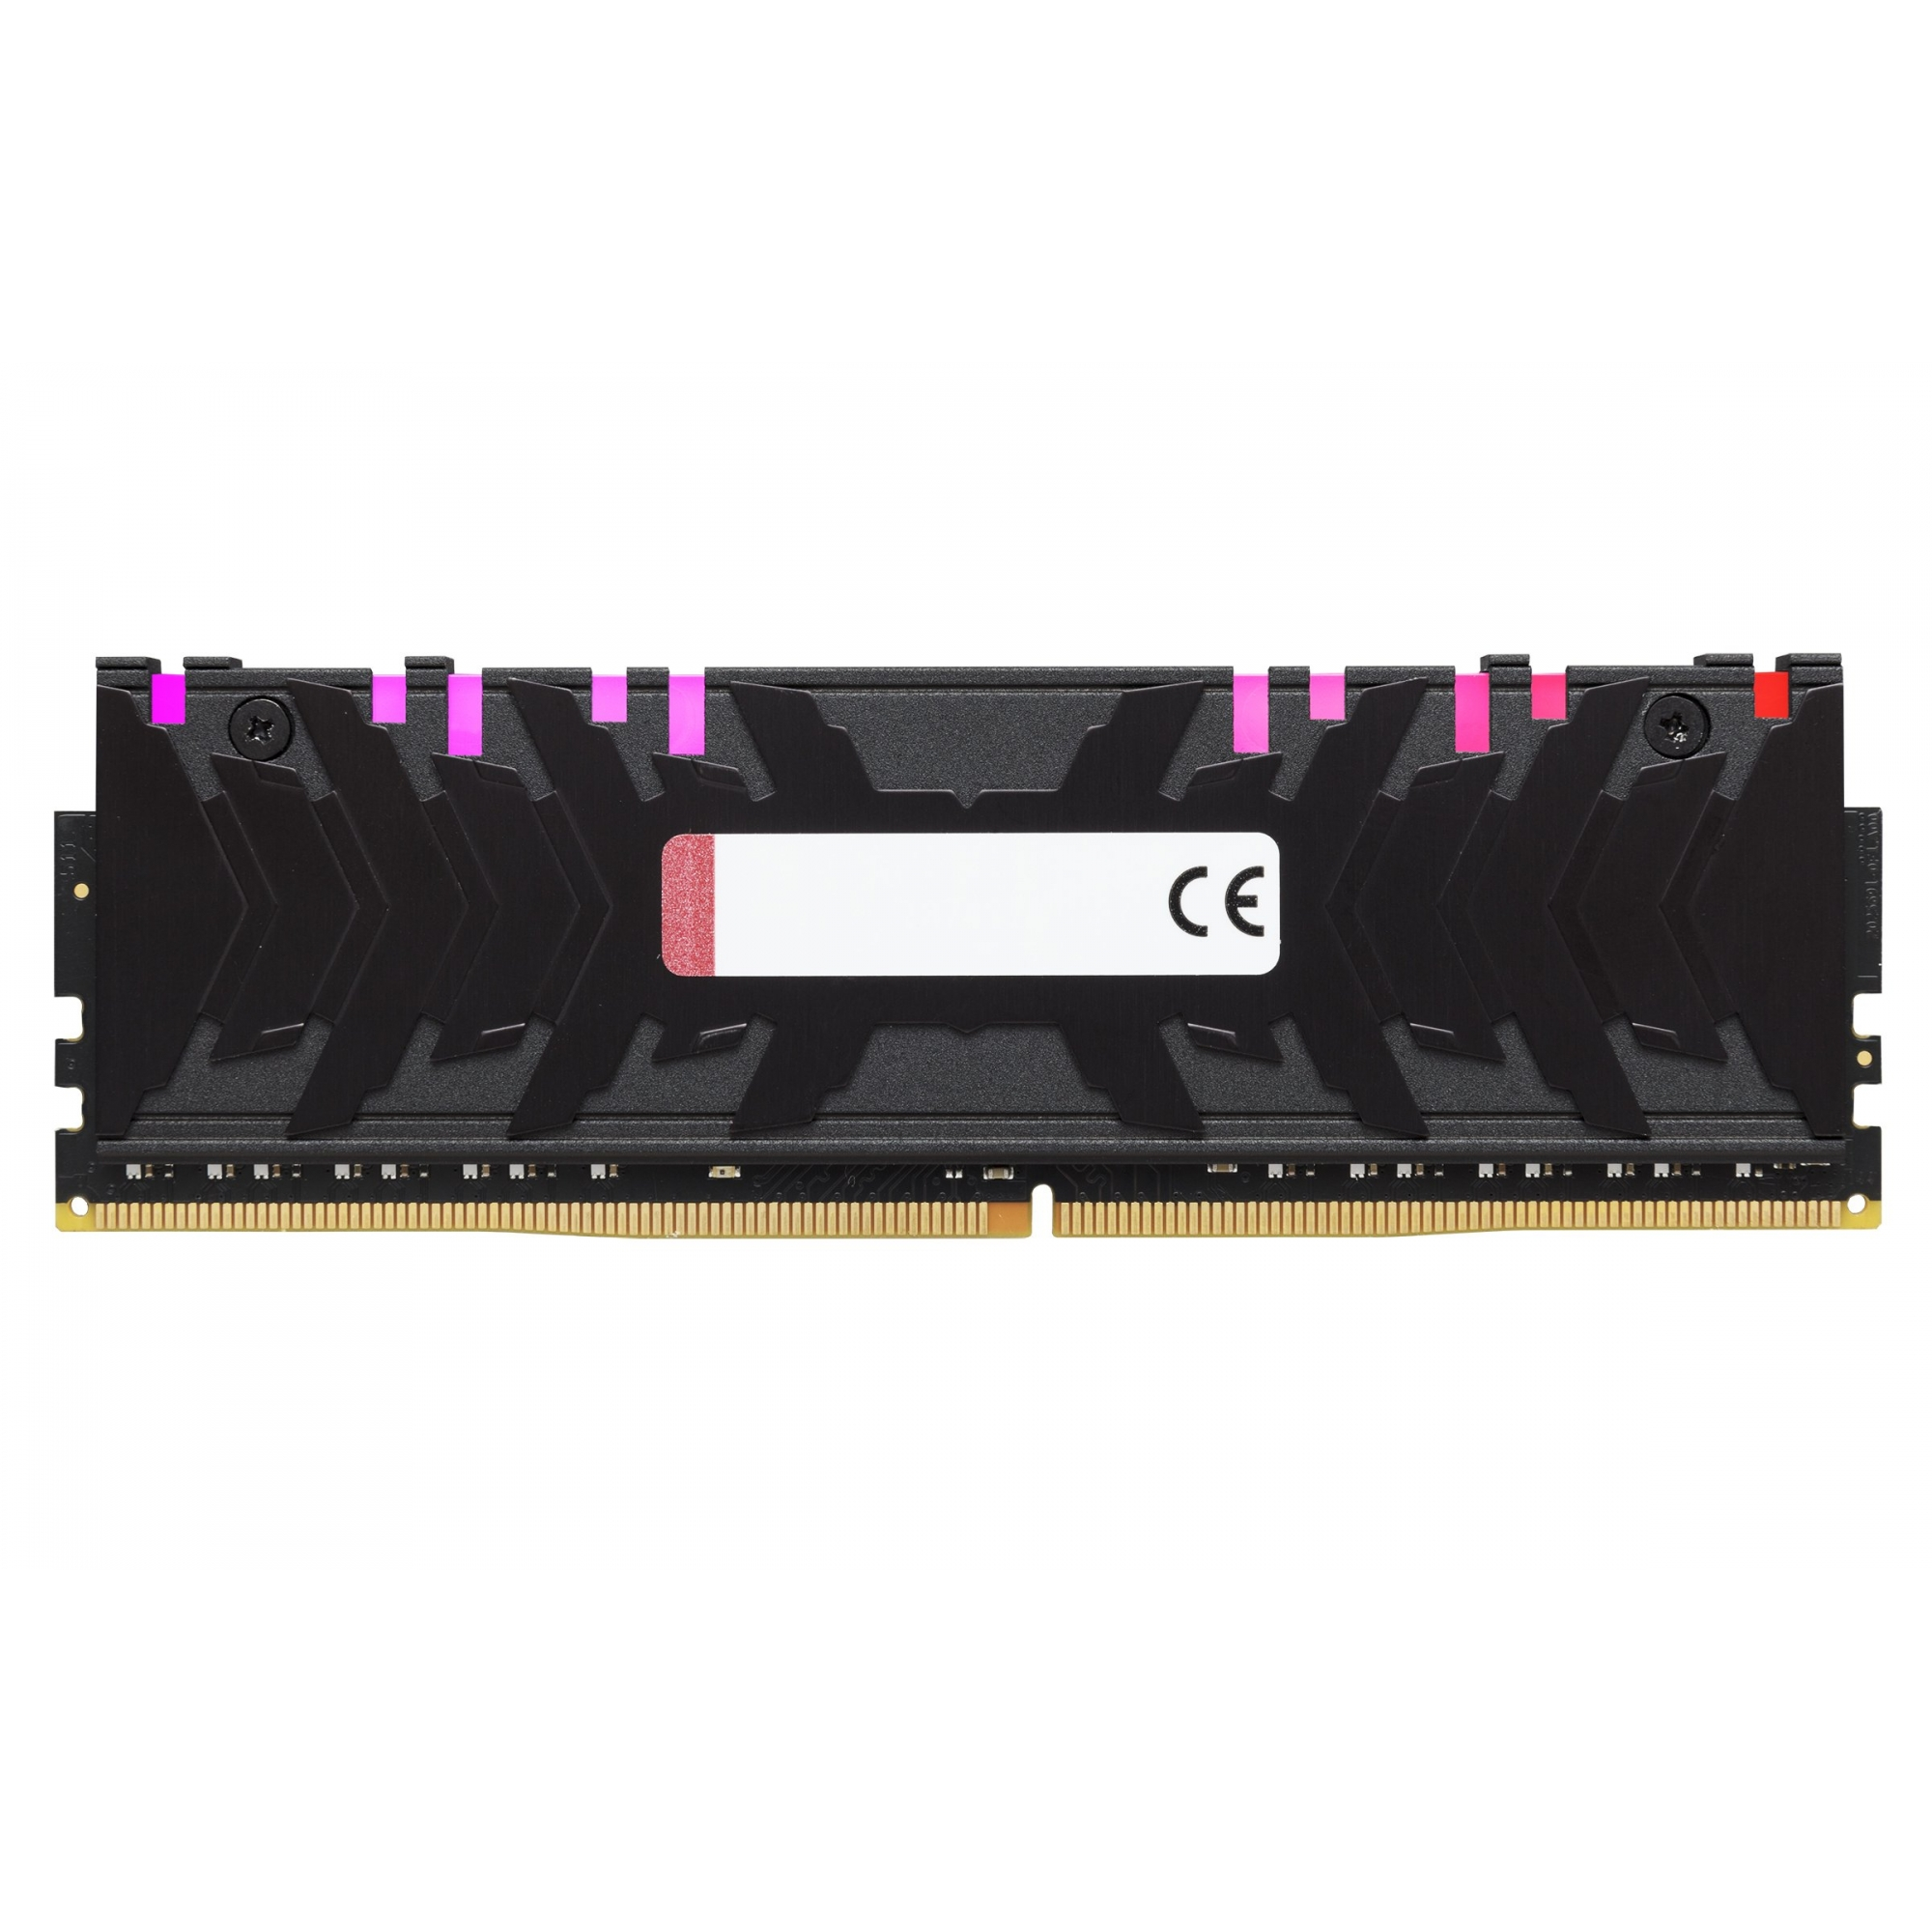 Memória DDR4 Kingston HyperX Predator RGB, 16GB 3200MHz - HX432C16PB3A/16